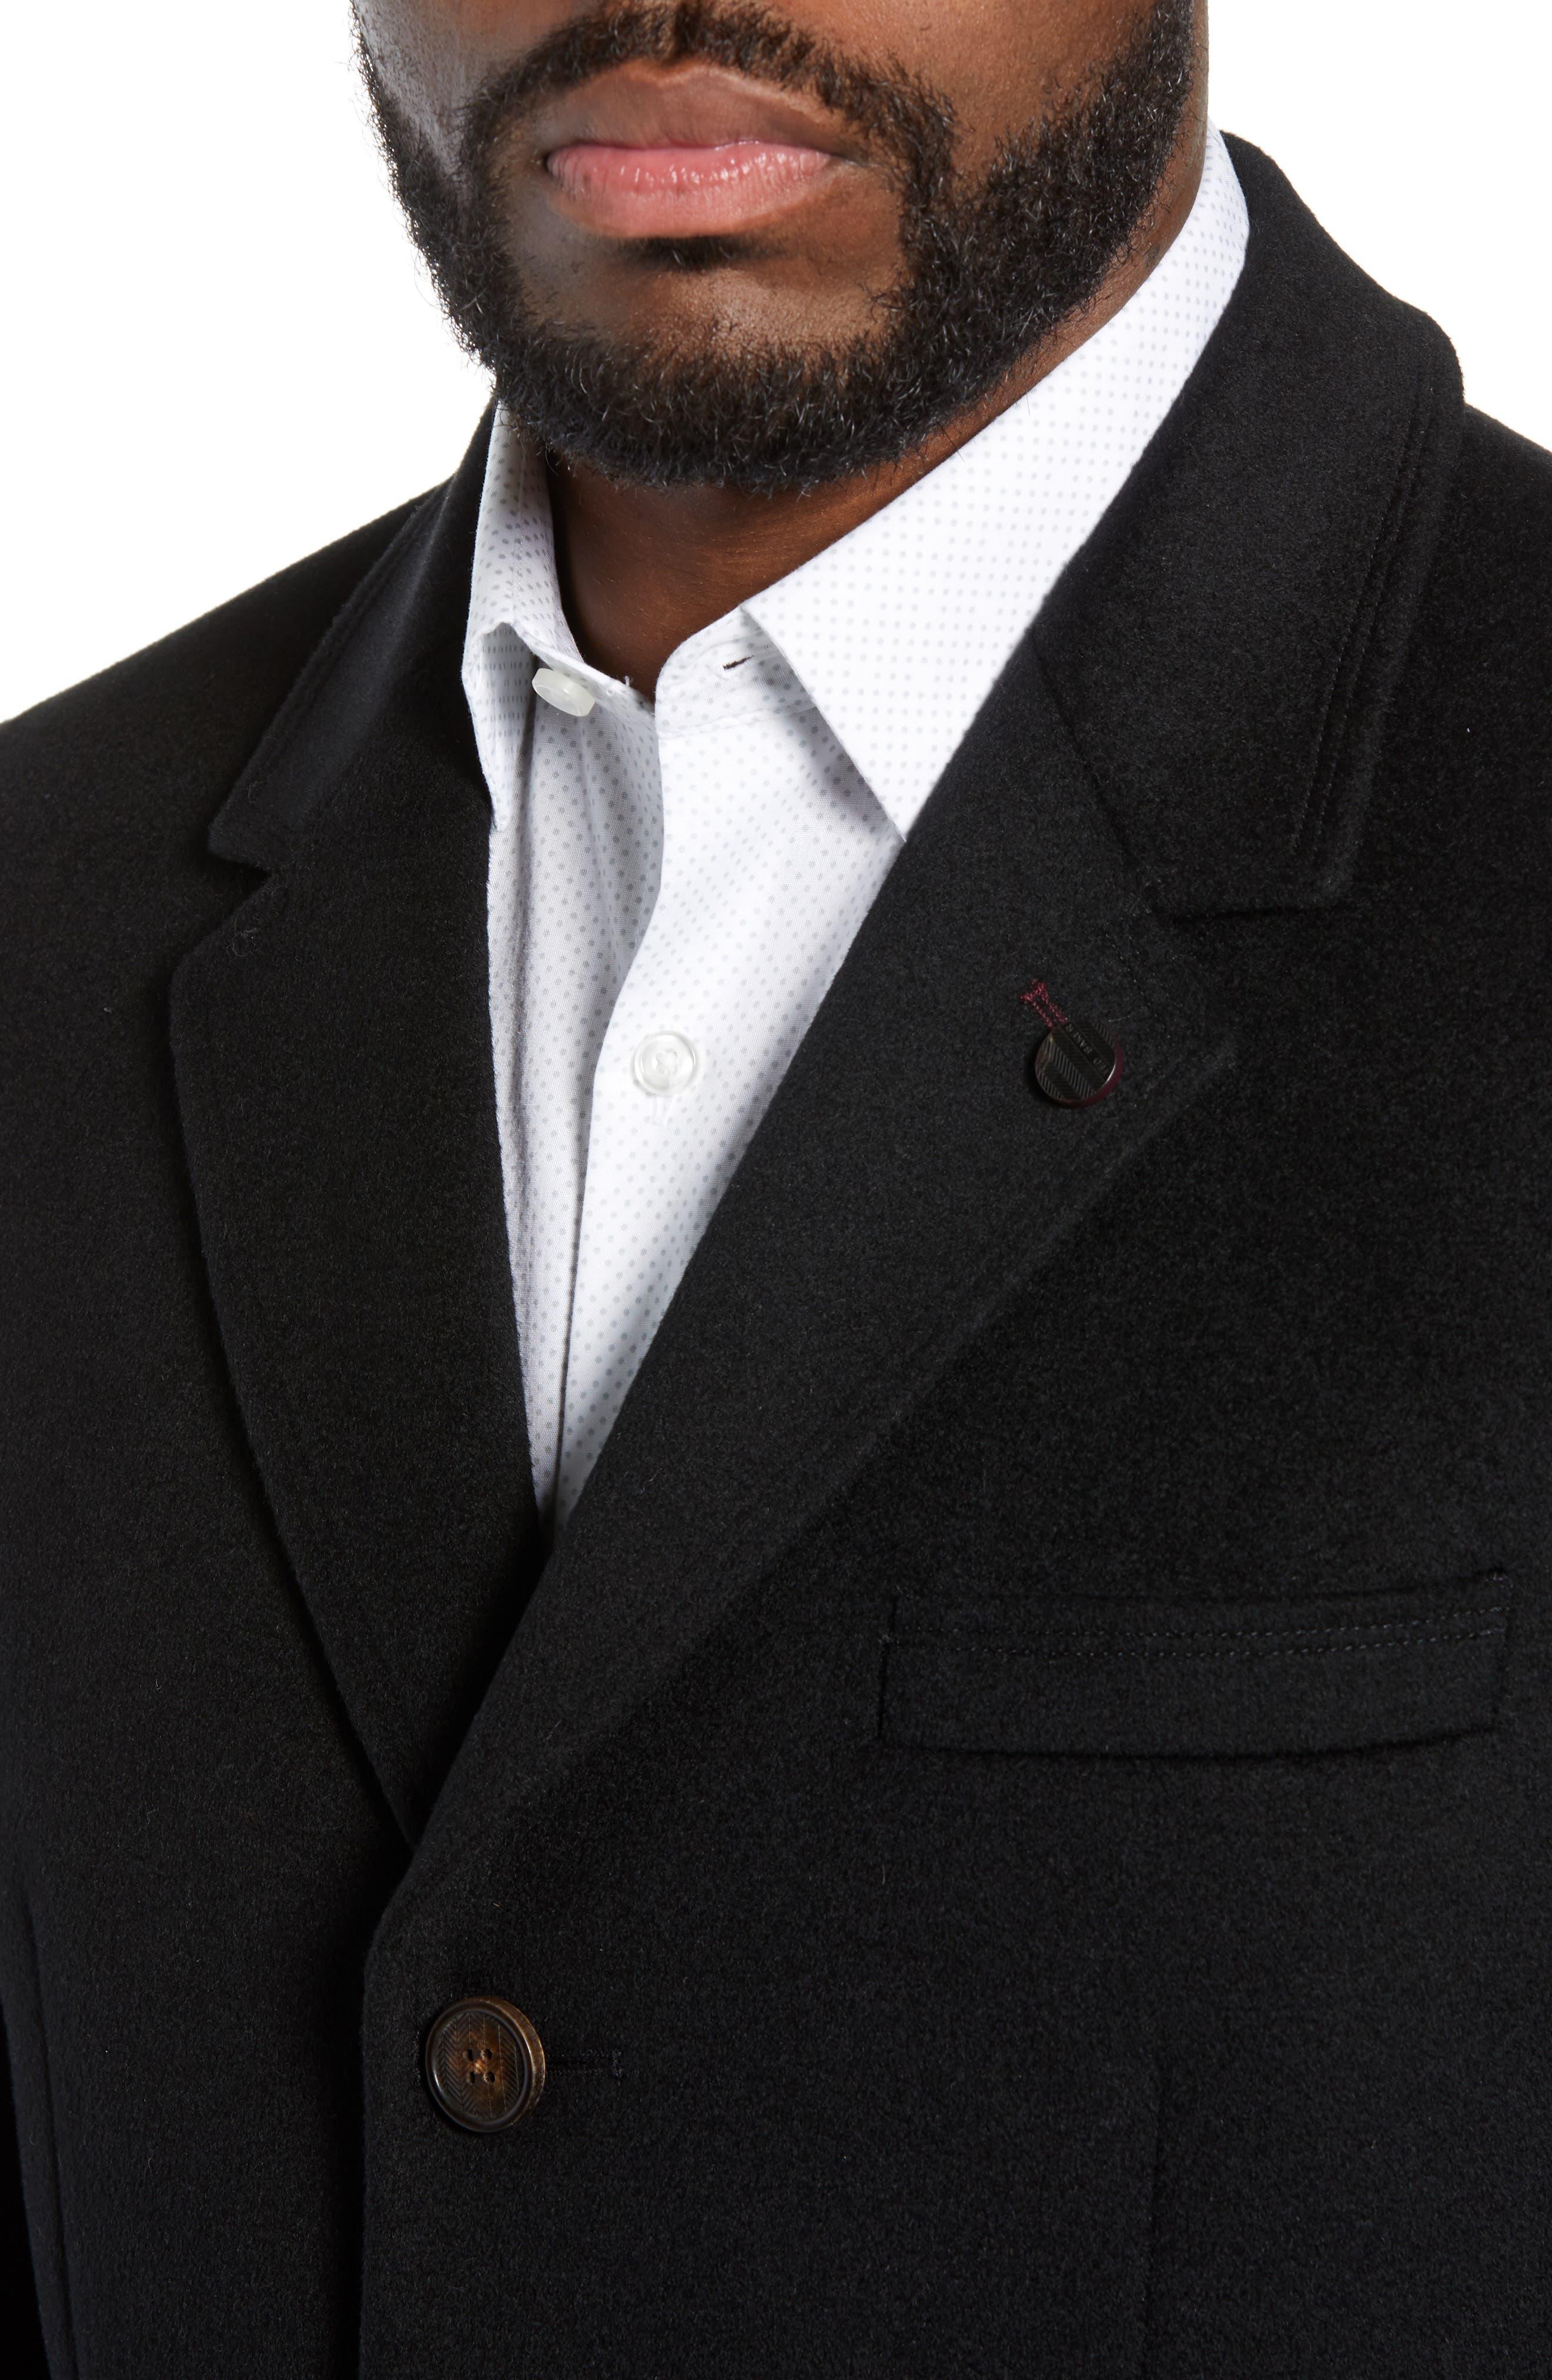 Swish Wool & Cashmere Overcoat,                             Alternate thumbnail 4, color,                             001